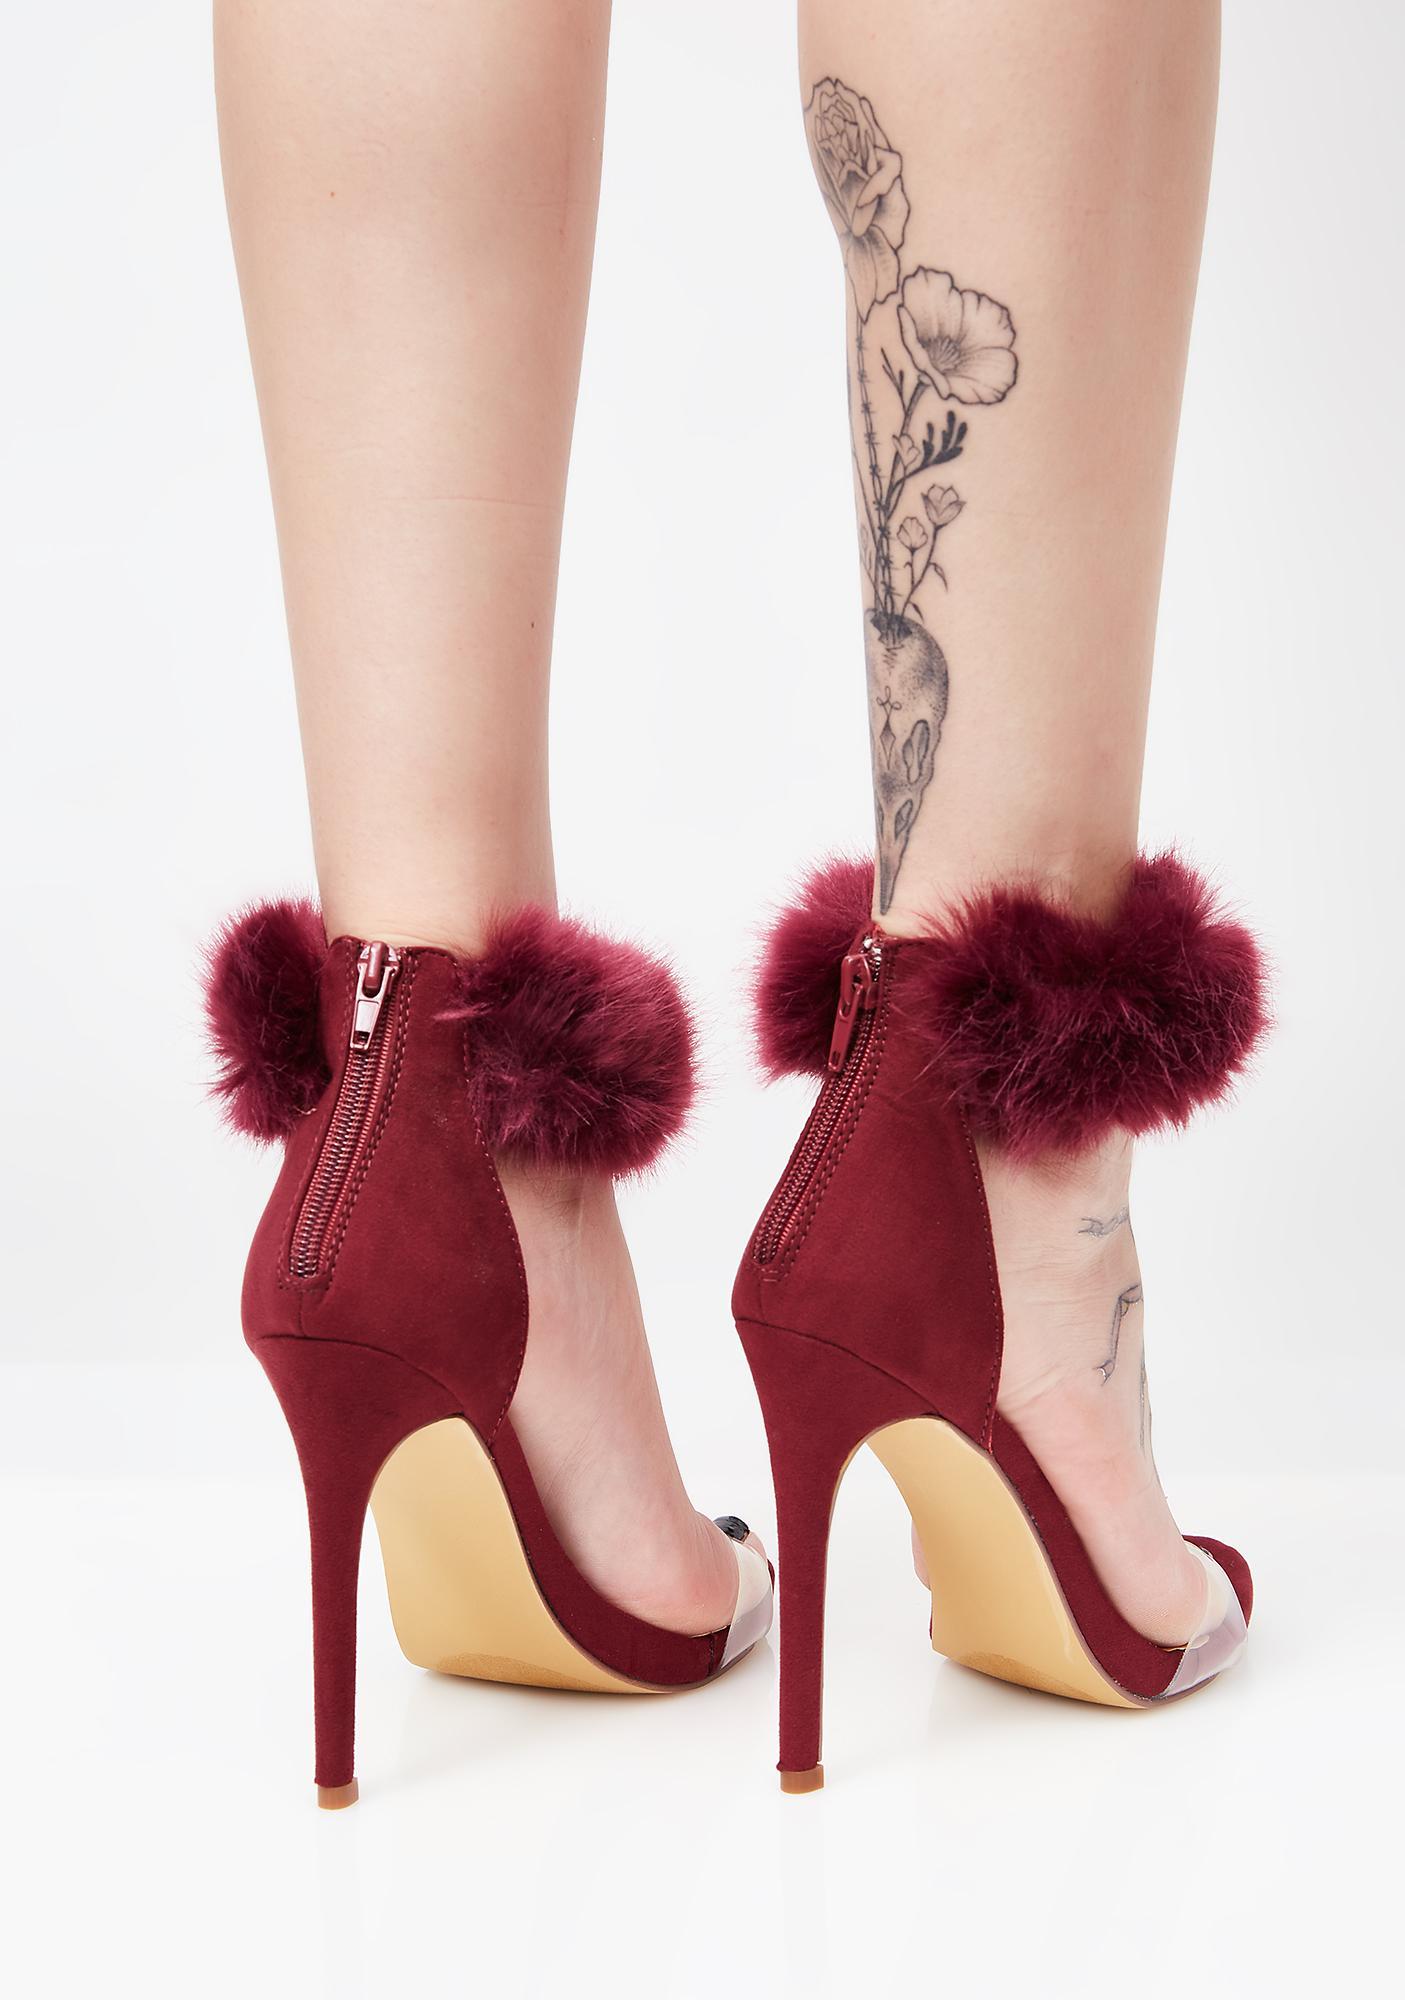 Lush Fuzz Freaq Heels